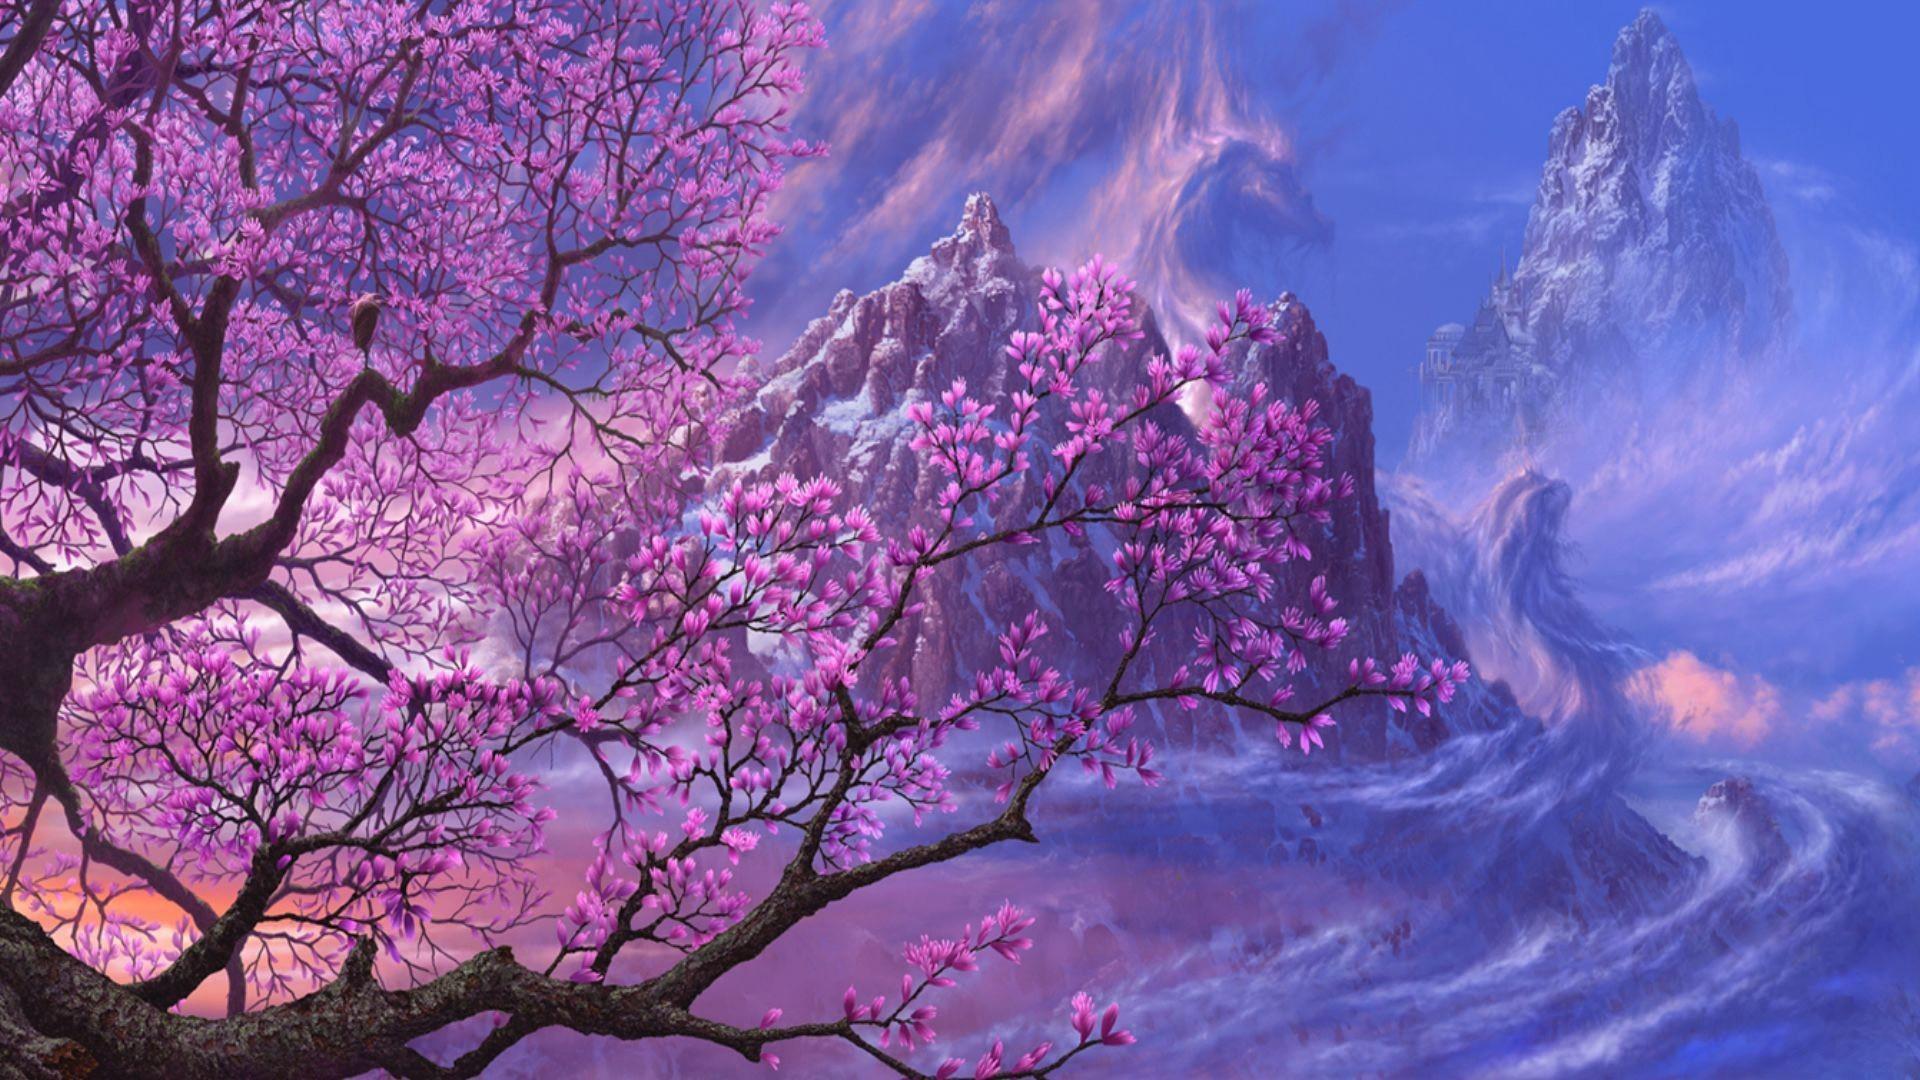 Res: 1920x1080, anime artwork asia dragons fantasy art purple trees